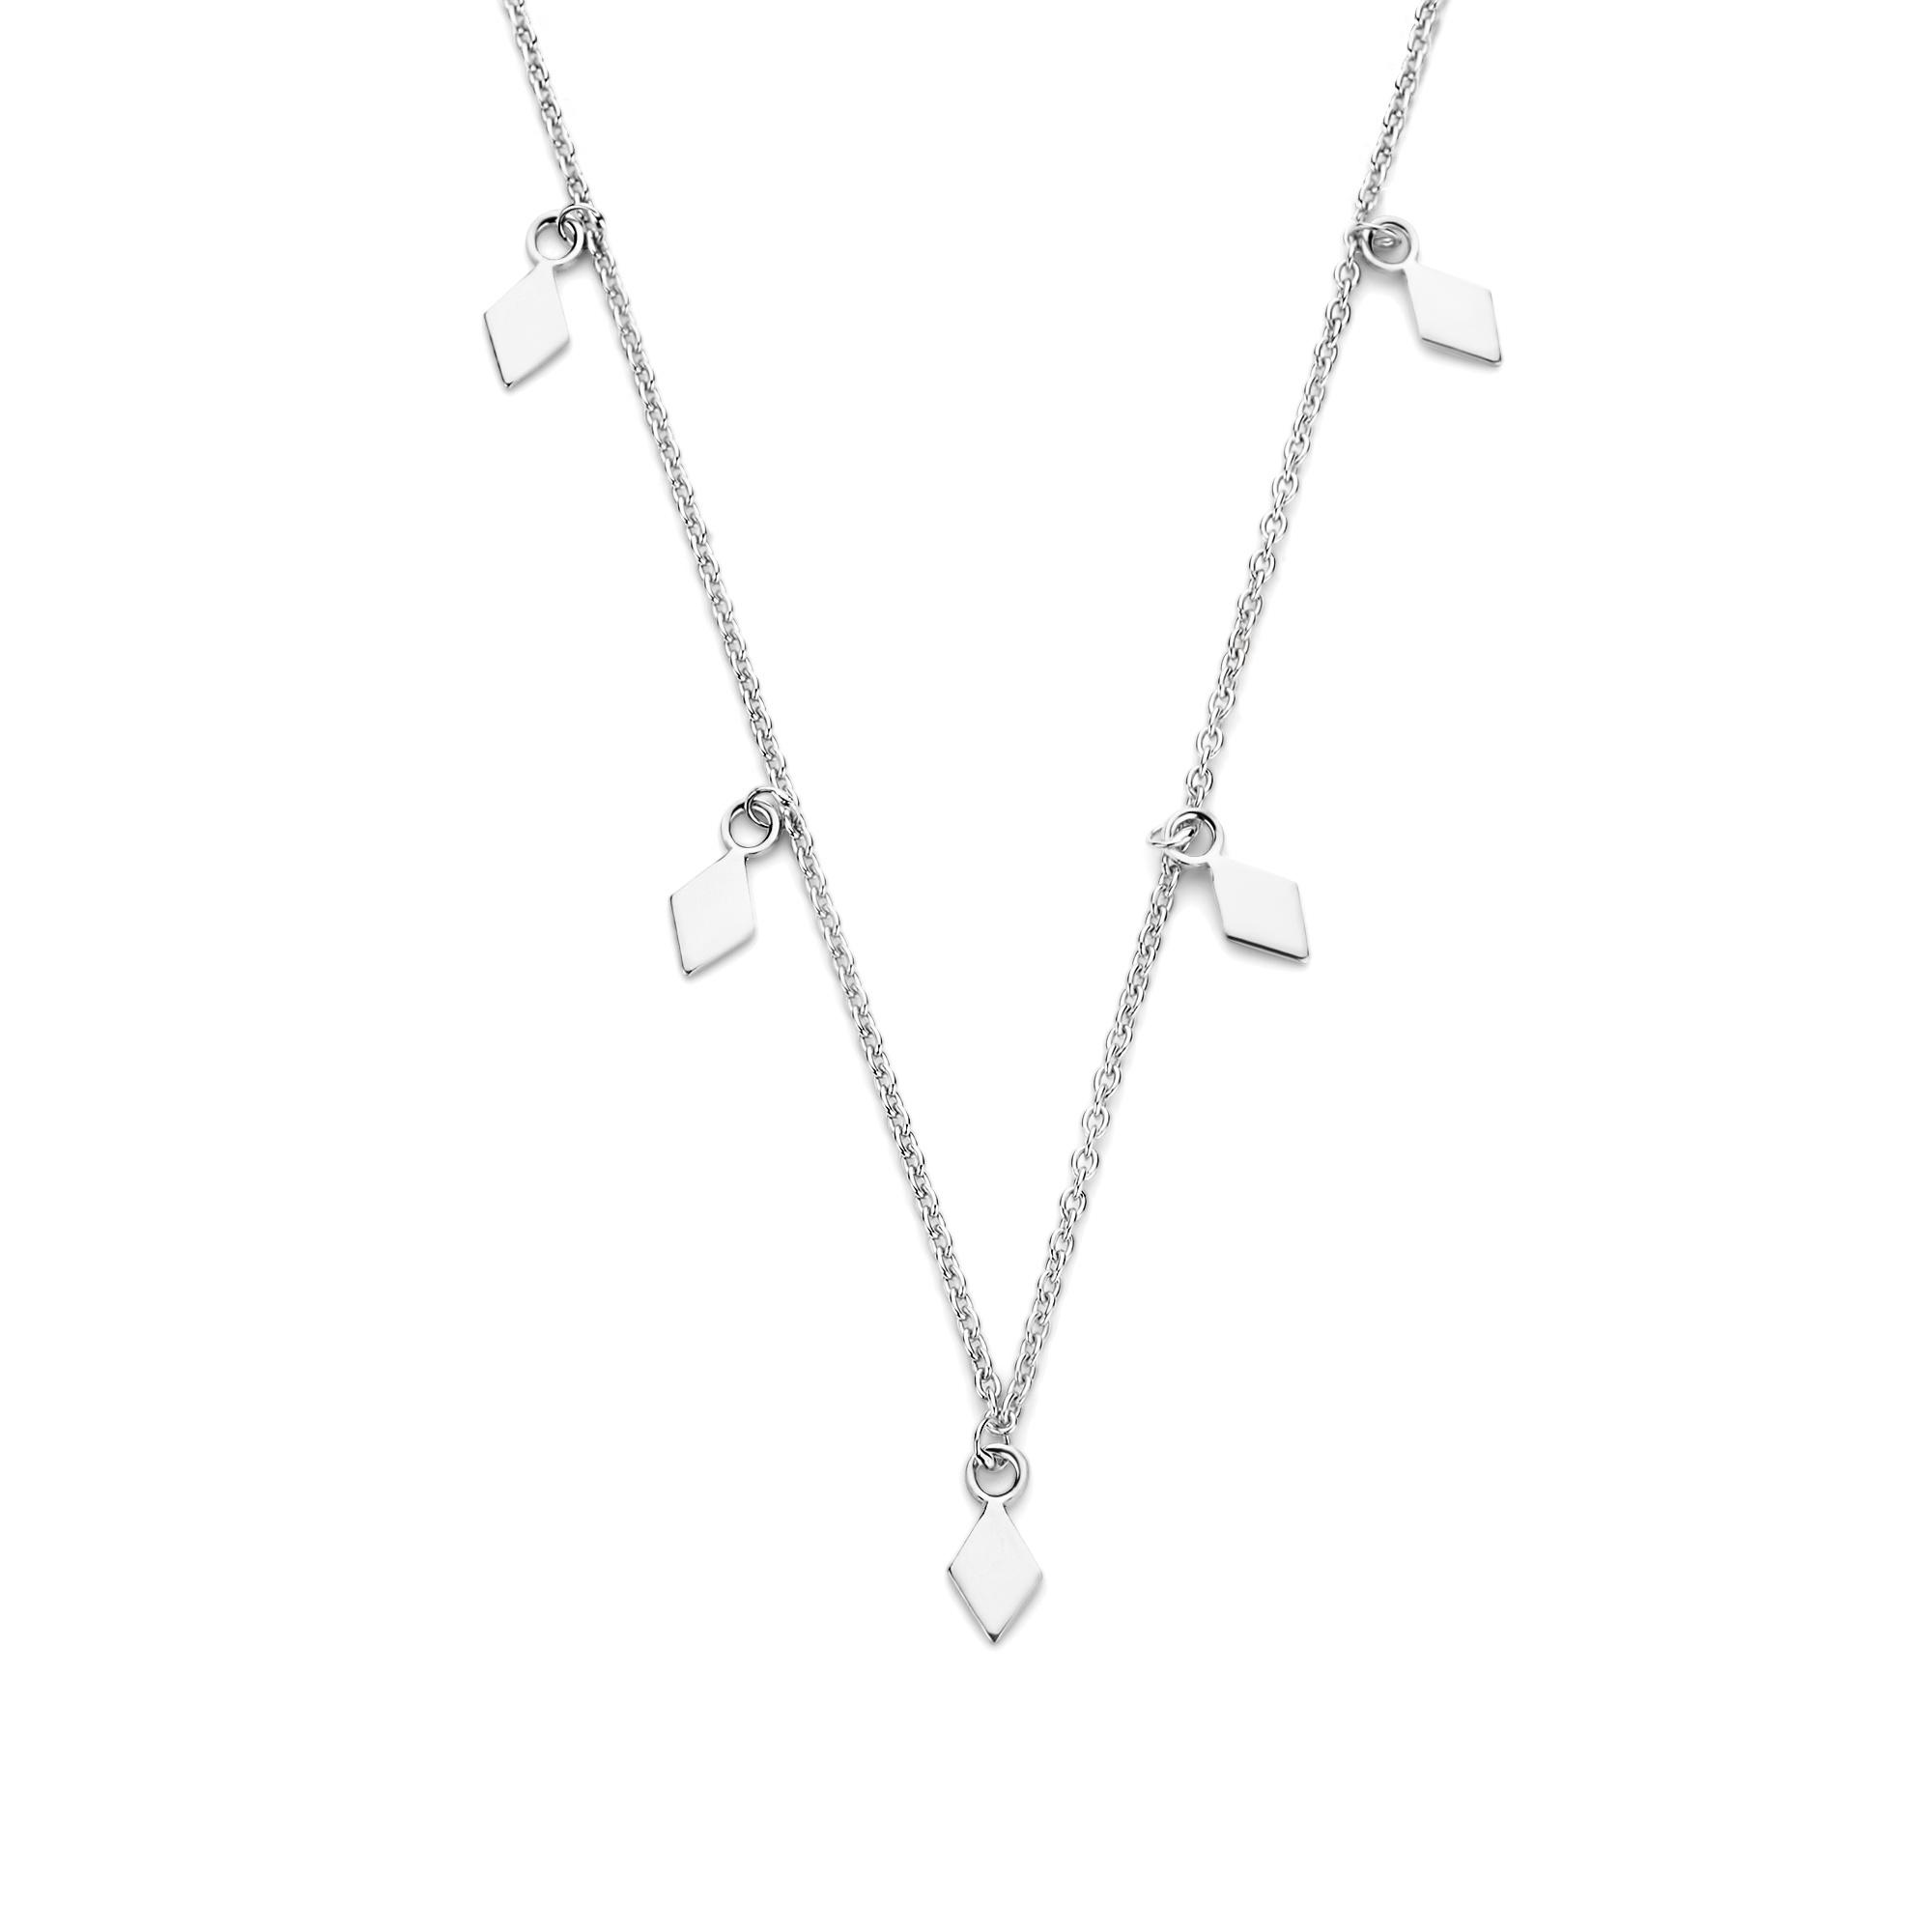 Selected Jewels Julie Sanne 925 sterling silver necklace